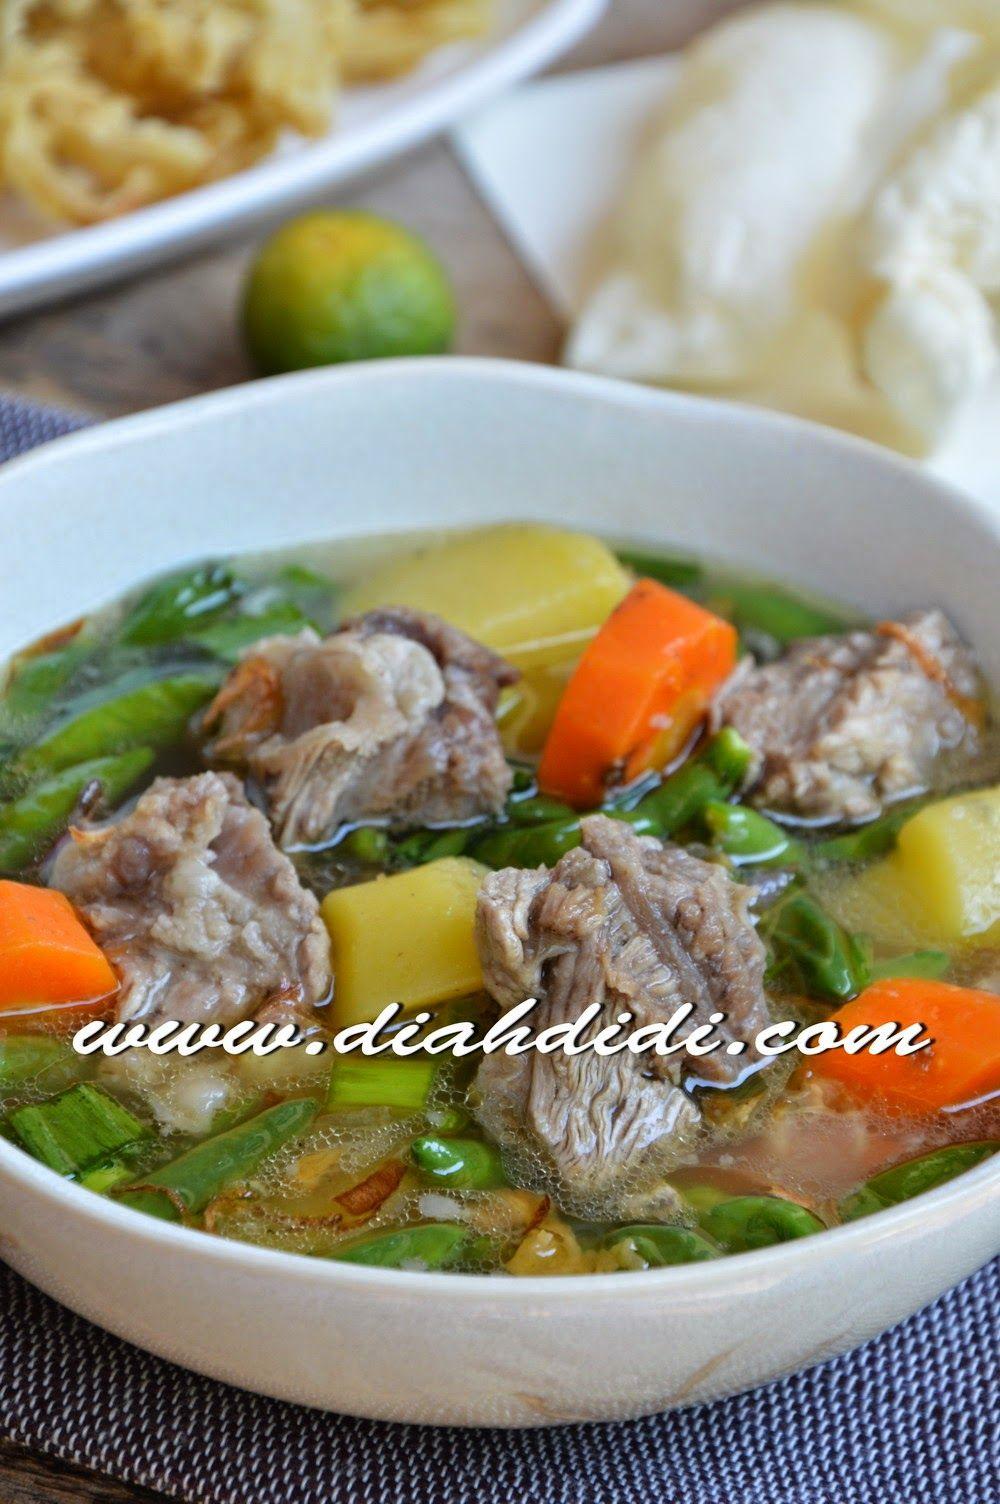 Sup Iga Pedas Ala Sop Janda Resep Masakan Resep Masakan Sehat Masakan